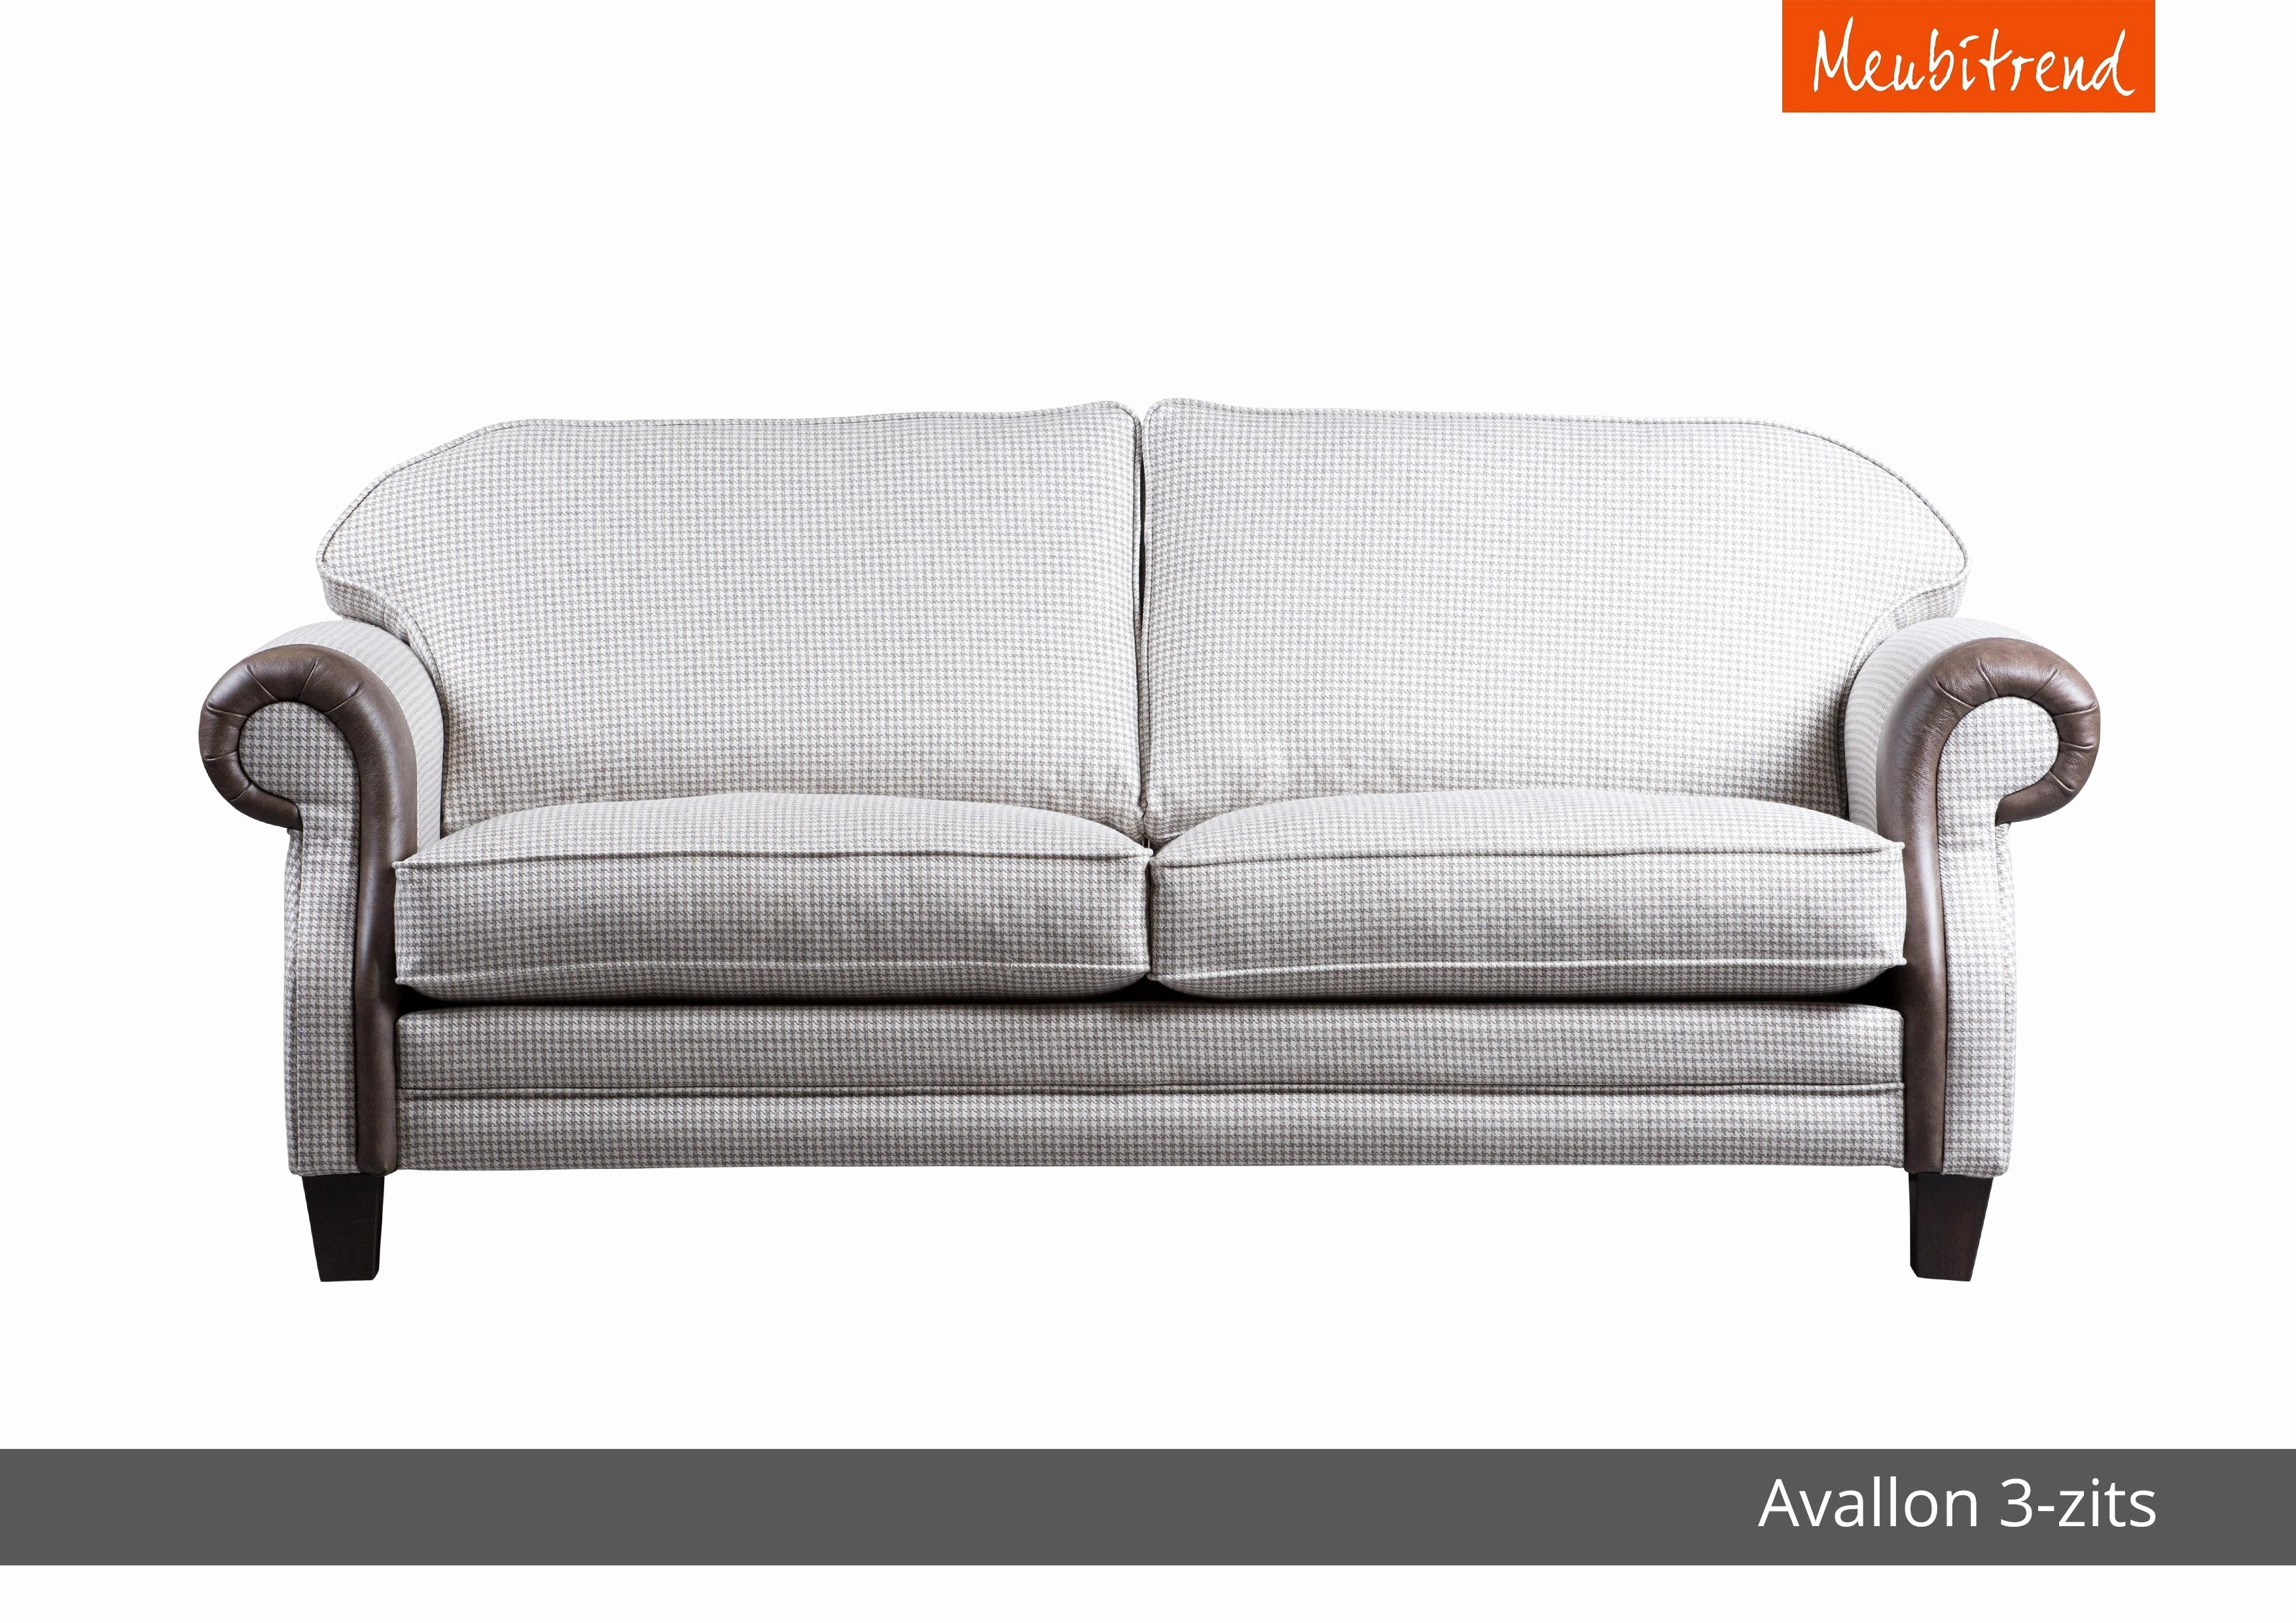 Ektorp 2 Places Luxe Galerie 50 Luxury Ikea Ektorp Sleeper sofa Pics 50 S